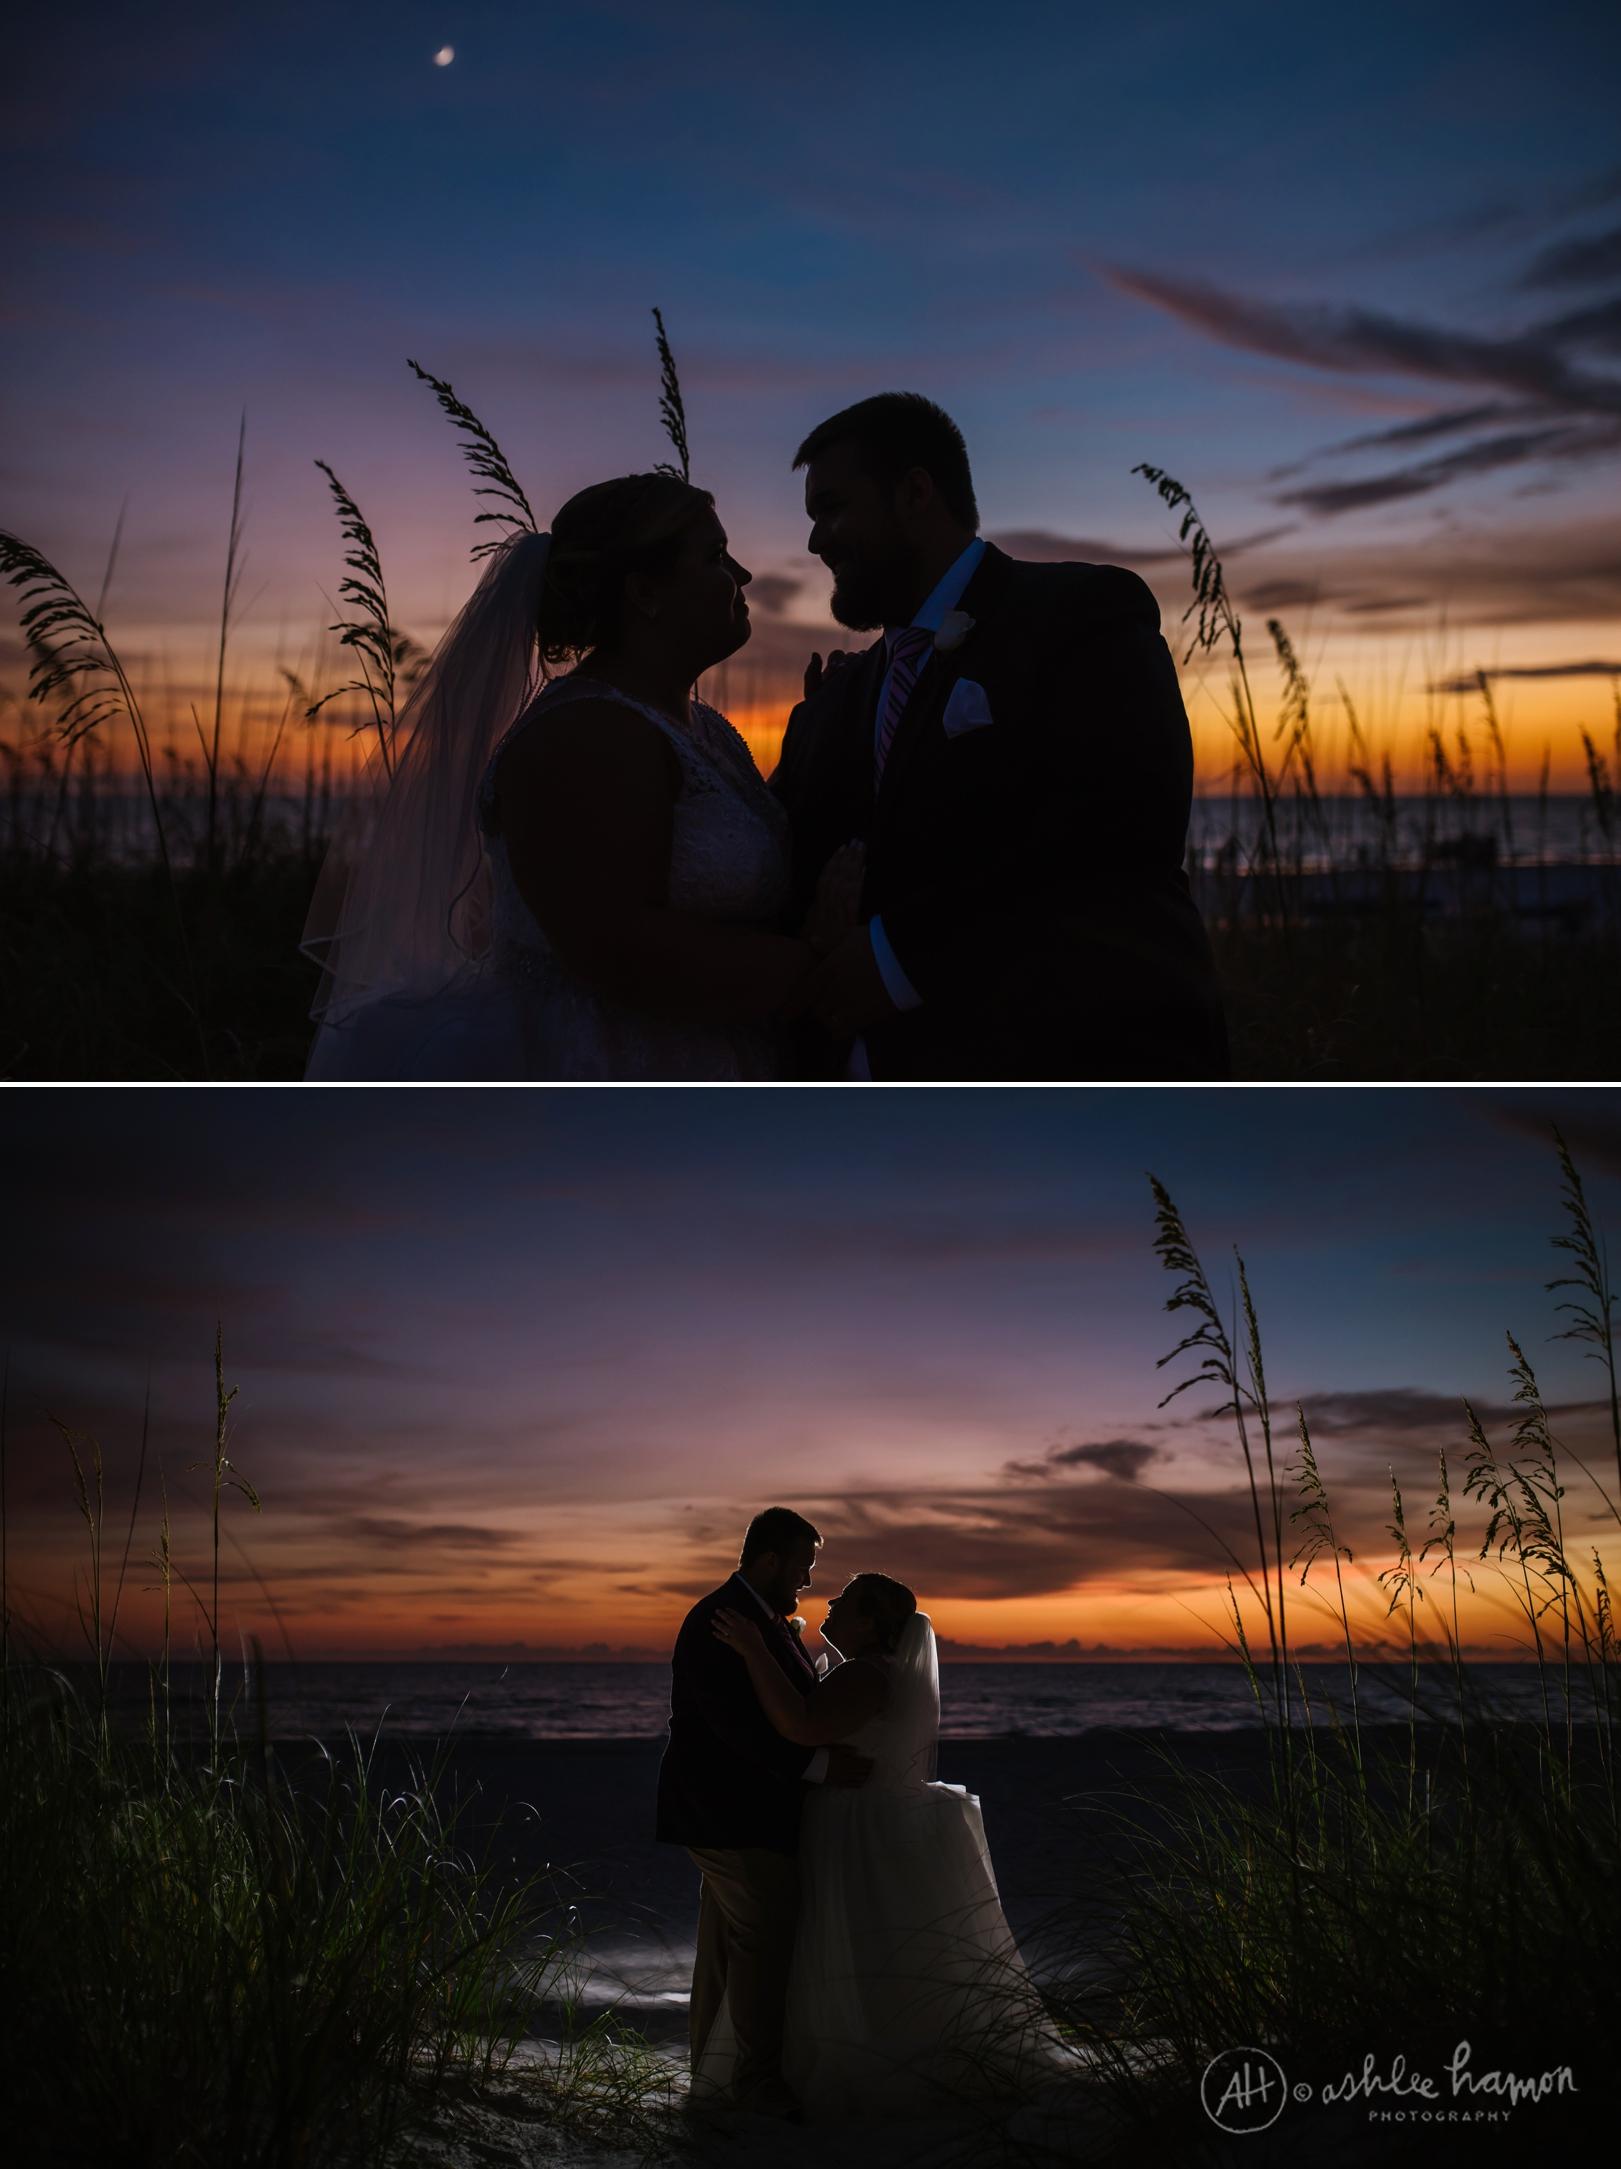 St-pete-wedding-photographer-don-caesar-ashlee-hamon_0032.jpg